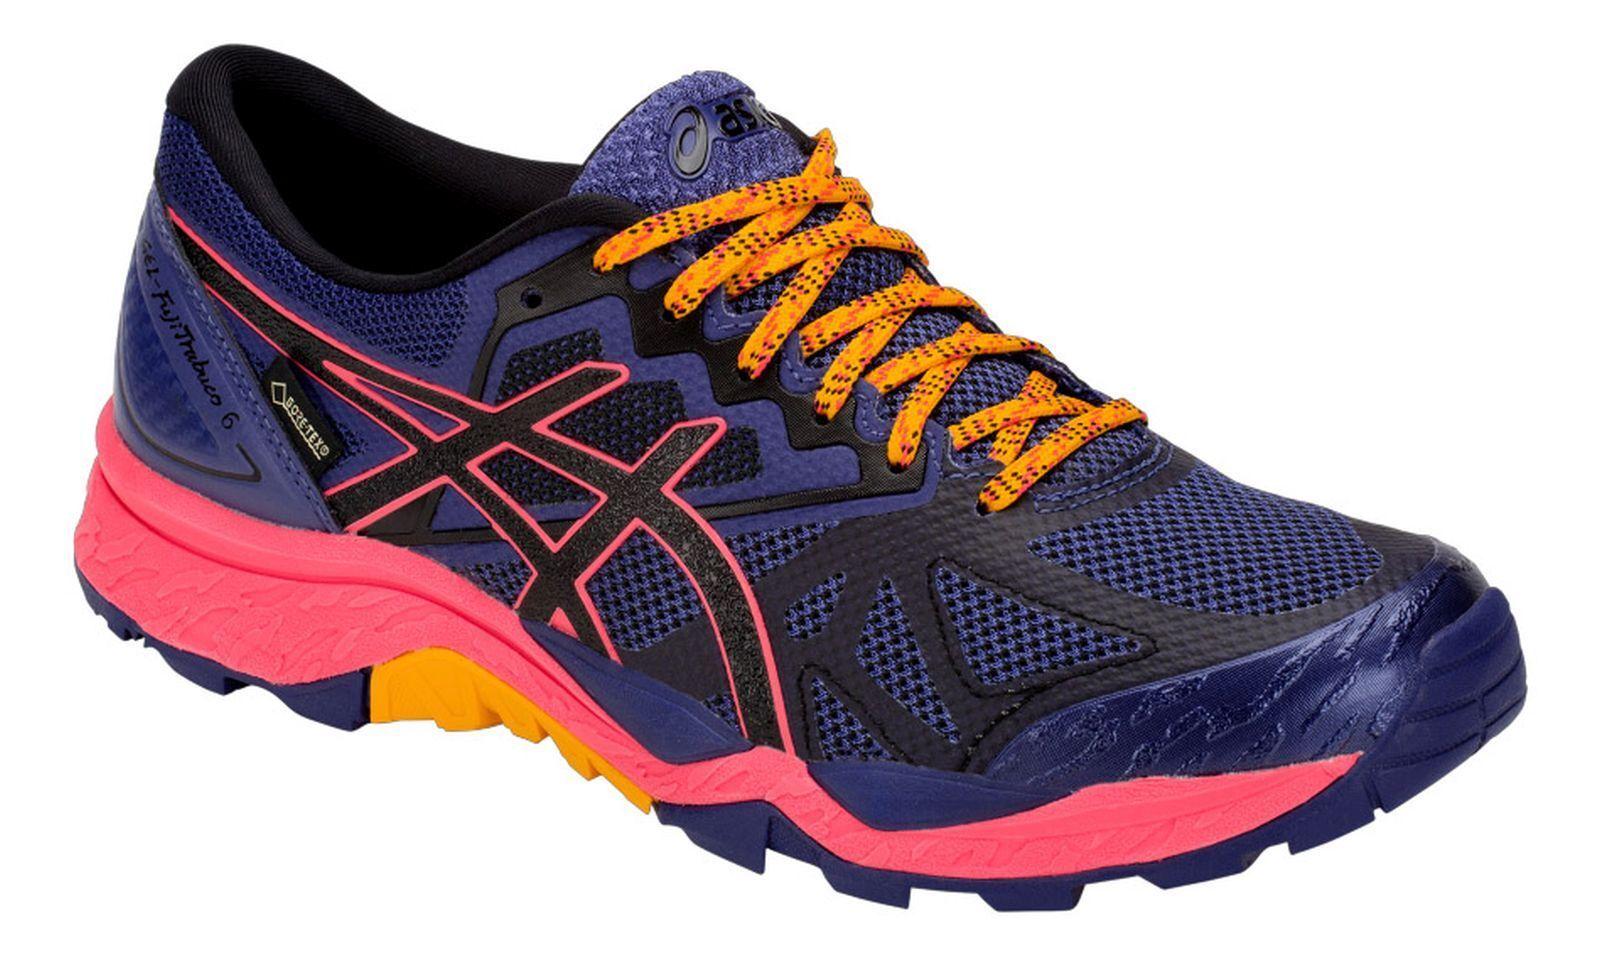 Asics Women's Running shoes Matrimonial Fujitrabuco 6 G-Tx bluee Multicolour